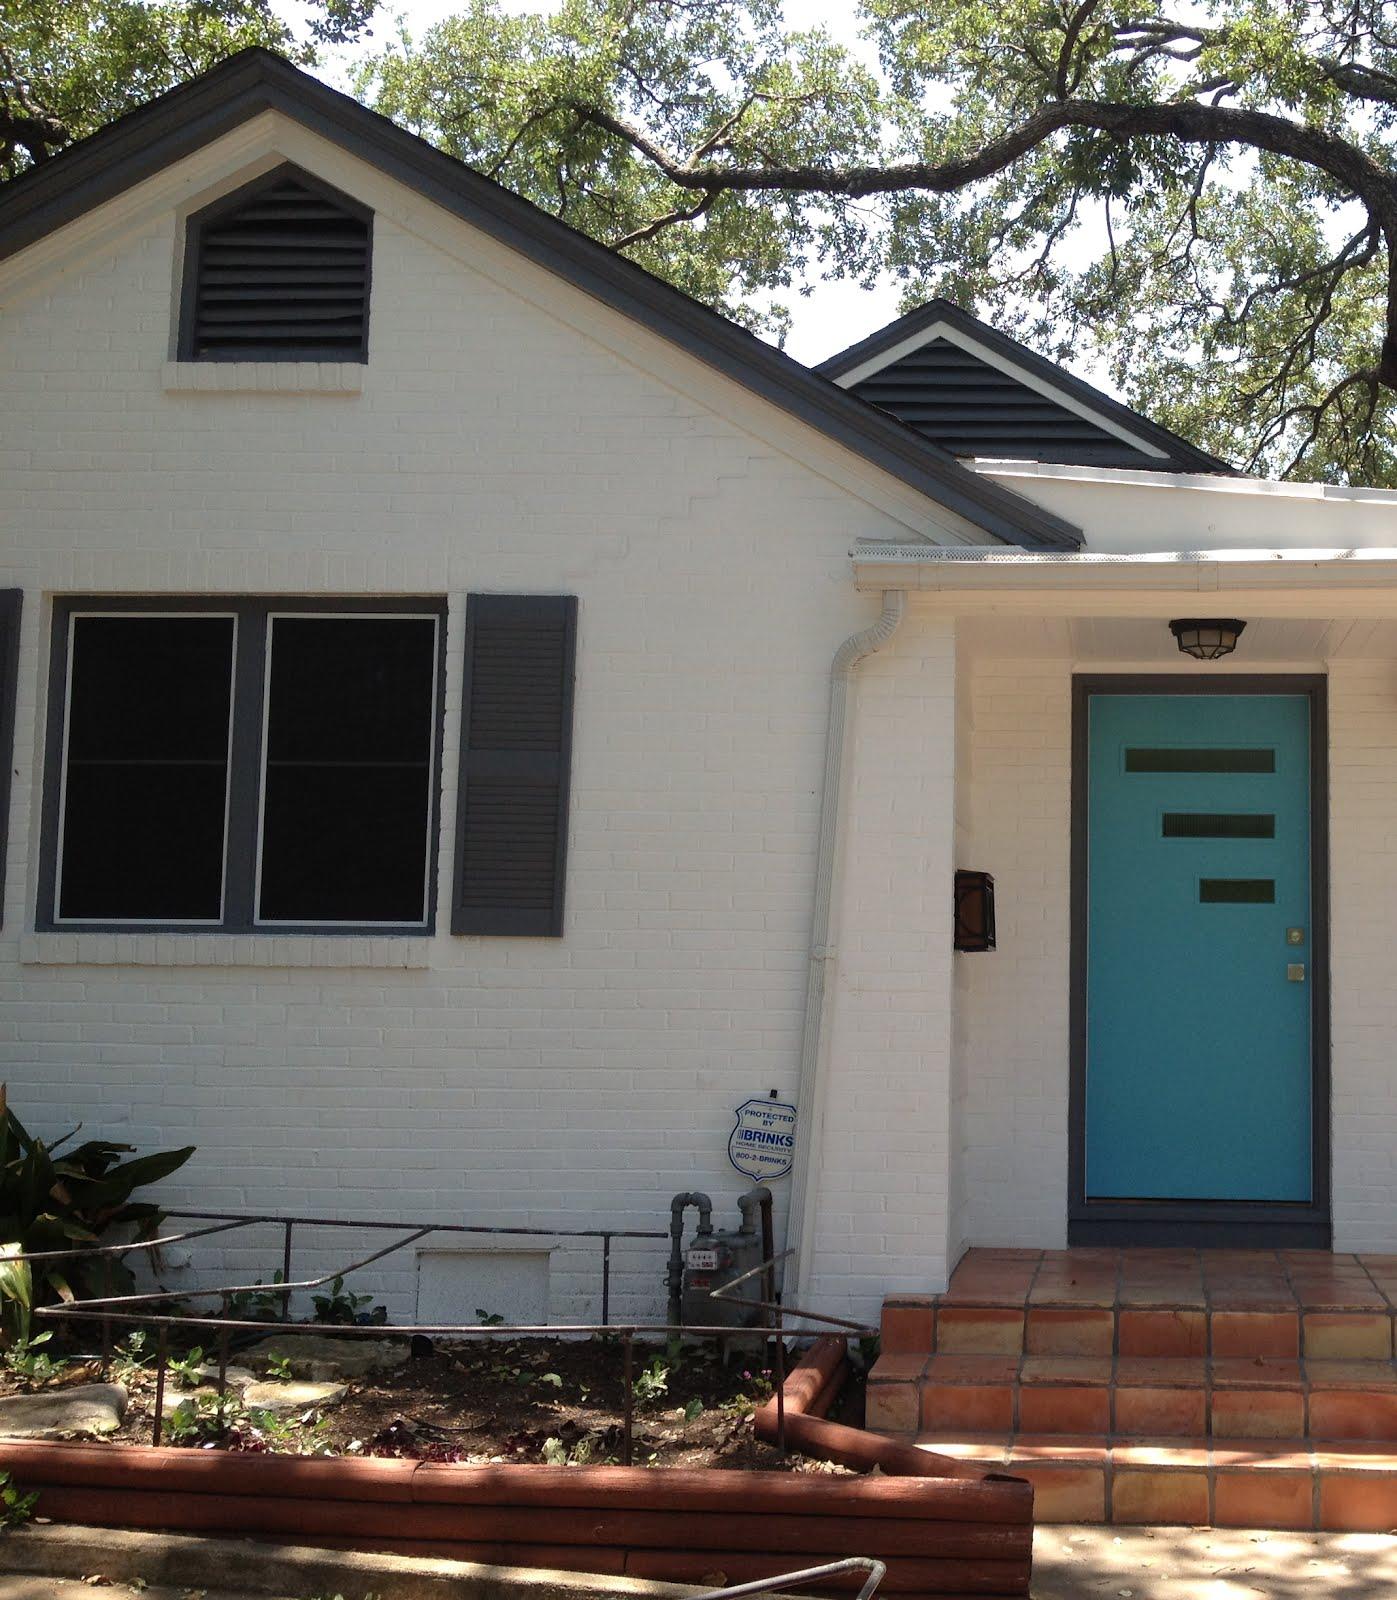 1600 #305B63 Mid Century Modern Front Doors. Image Of Install Mid Century  picture/photo Mid Century Front Doors 44391397